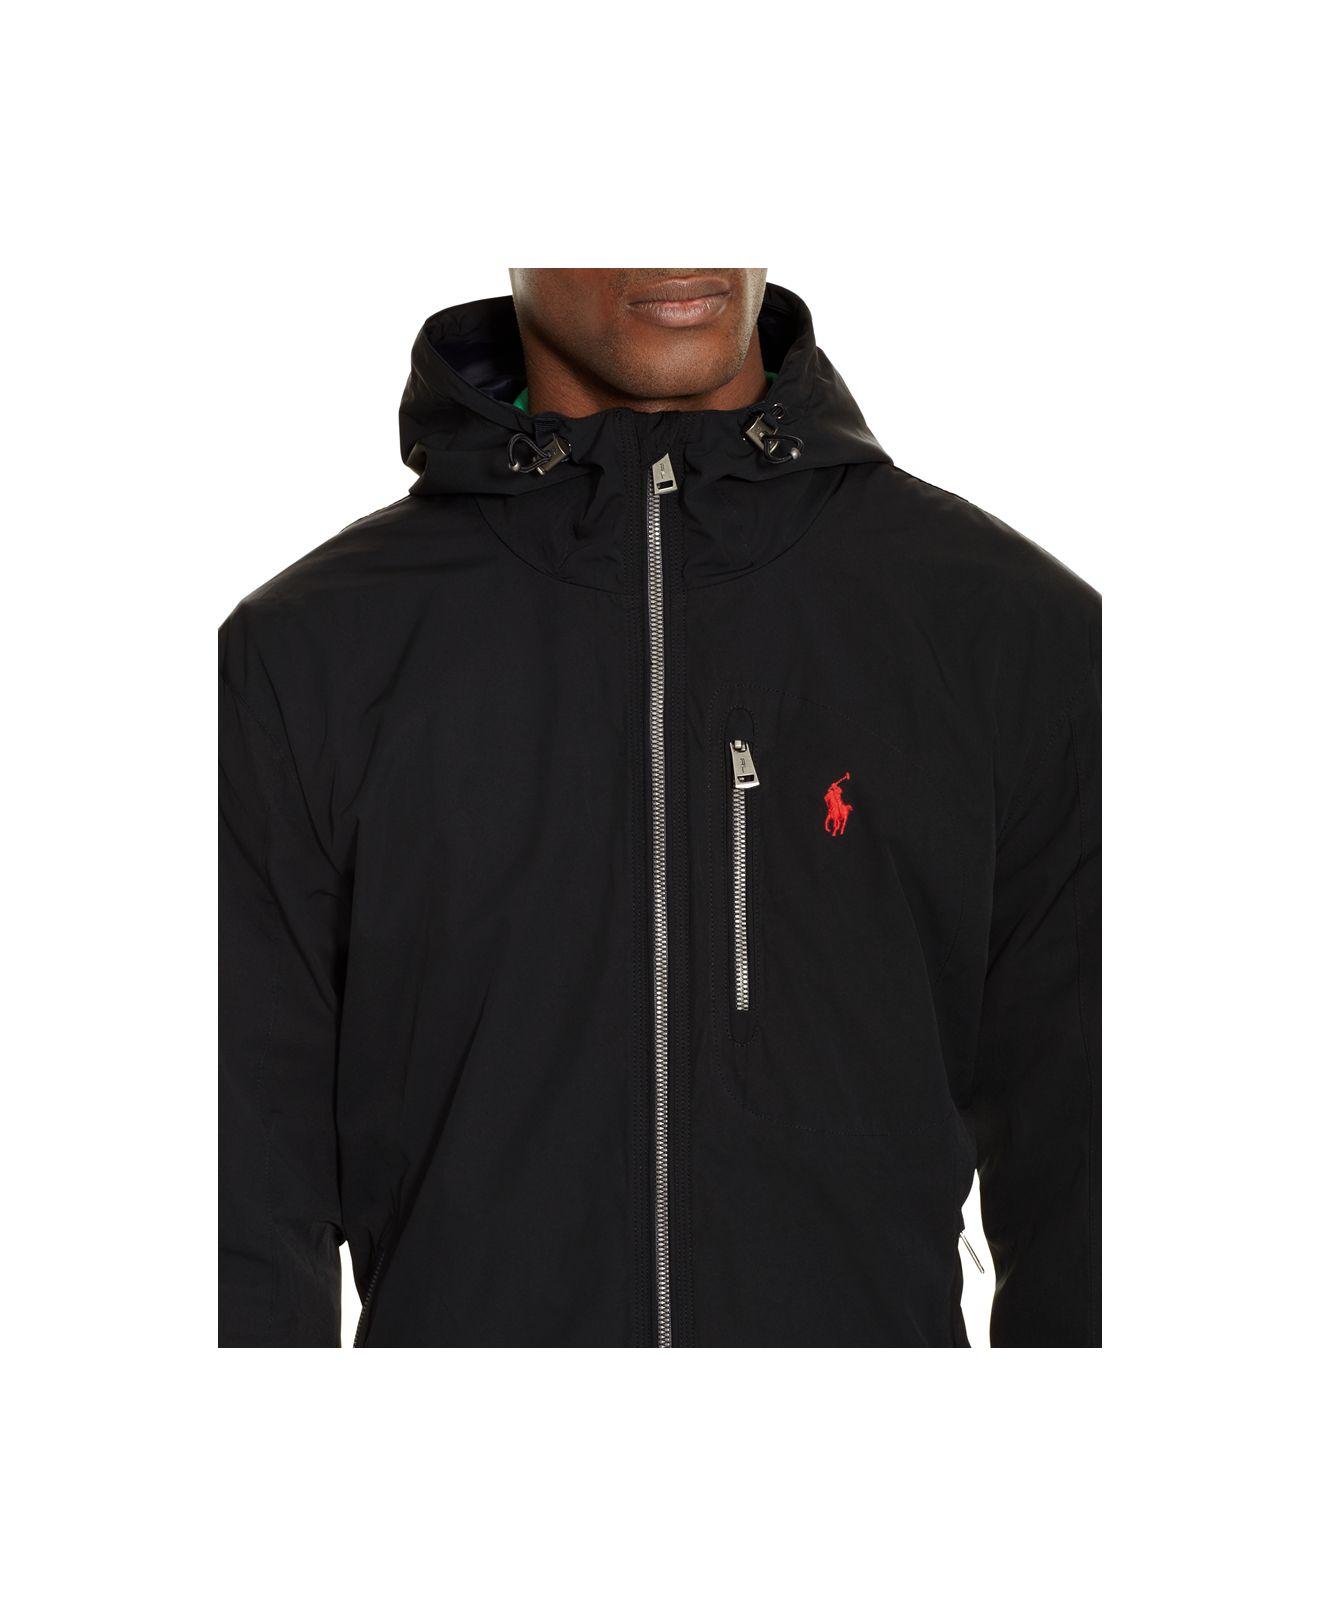 polo ralph lauren hooded anorak jacket in black for men lyst. Black Bedroom Furniture Sets. Home Design Ideas